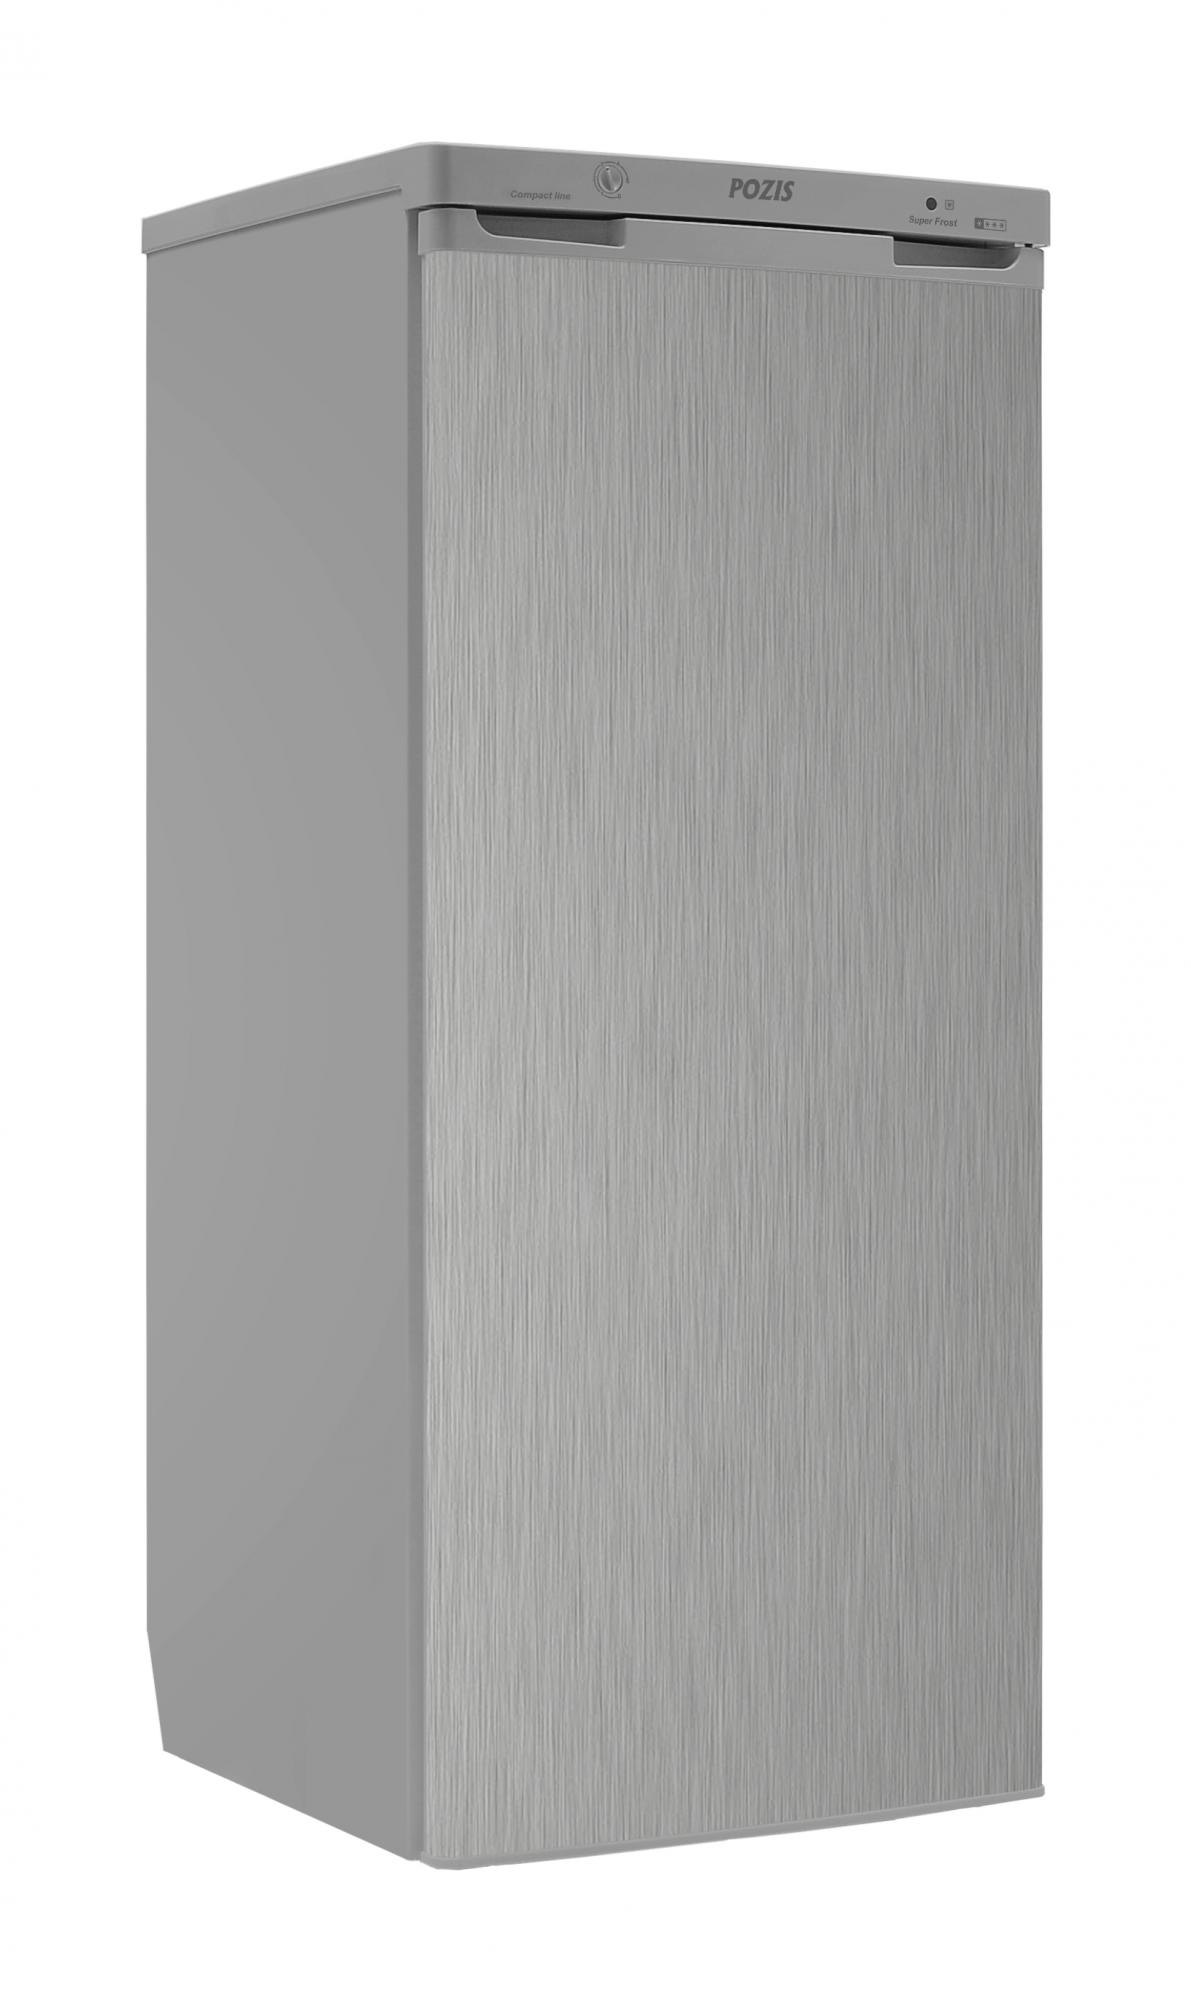 Морозильная камера POZIS FV 115 Silver Metallic